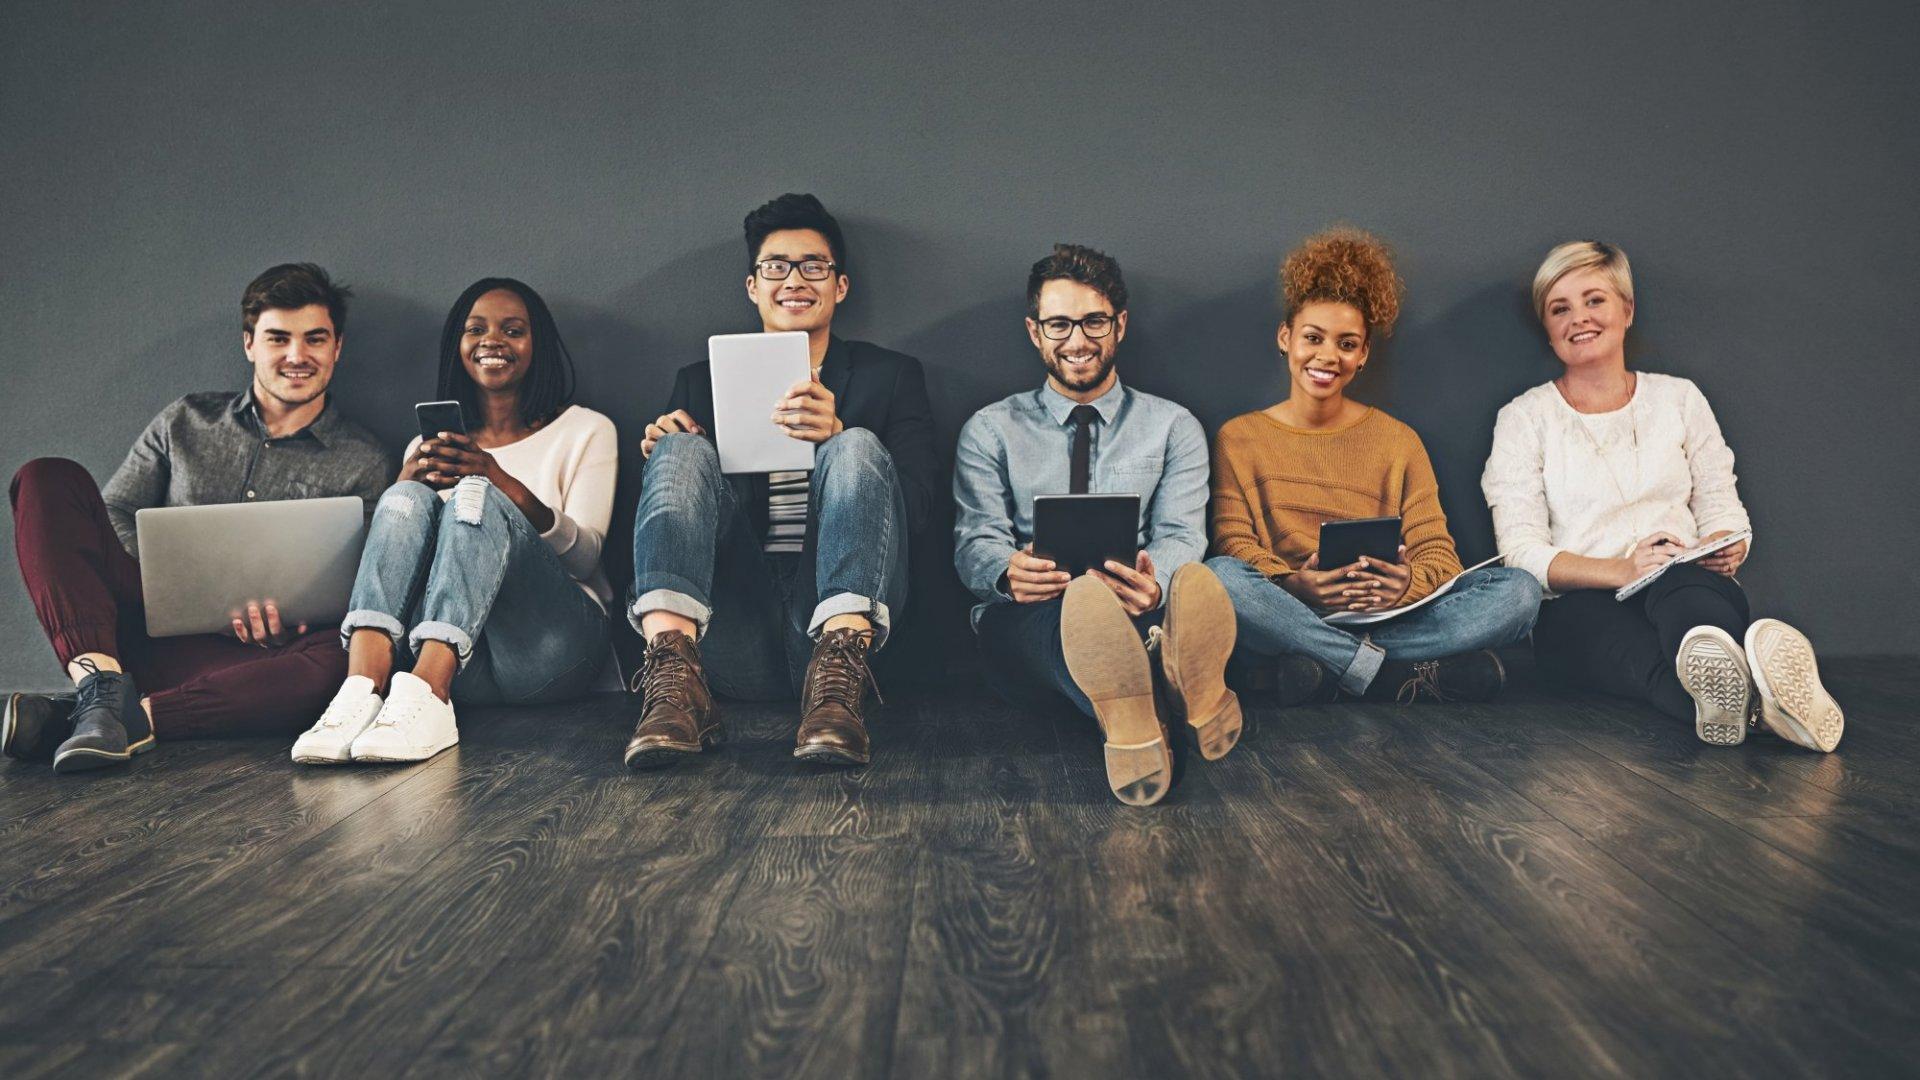 7 Surprising Ways Millennials Are Always More Successful at Work